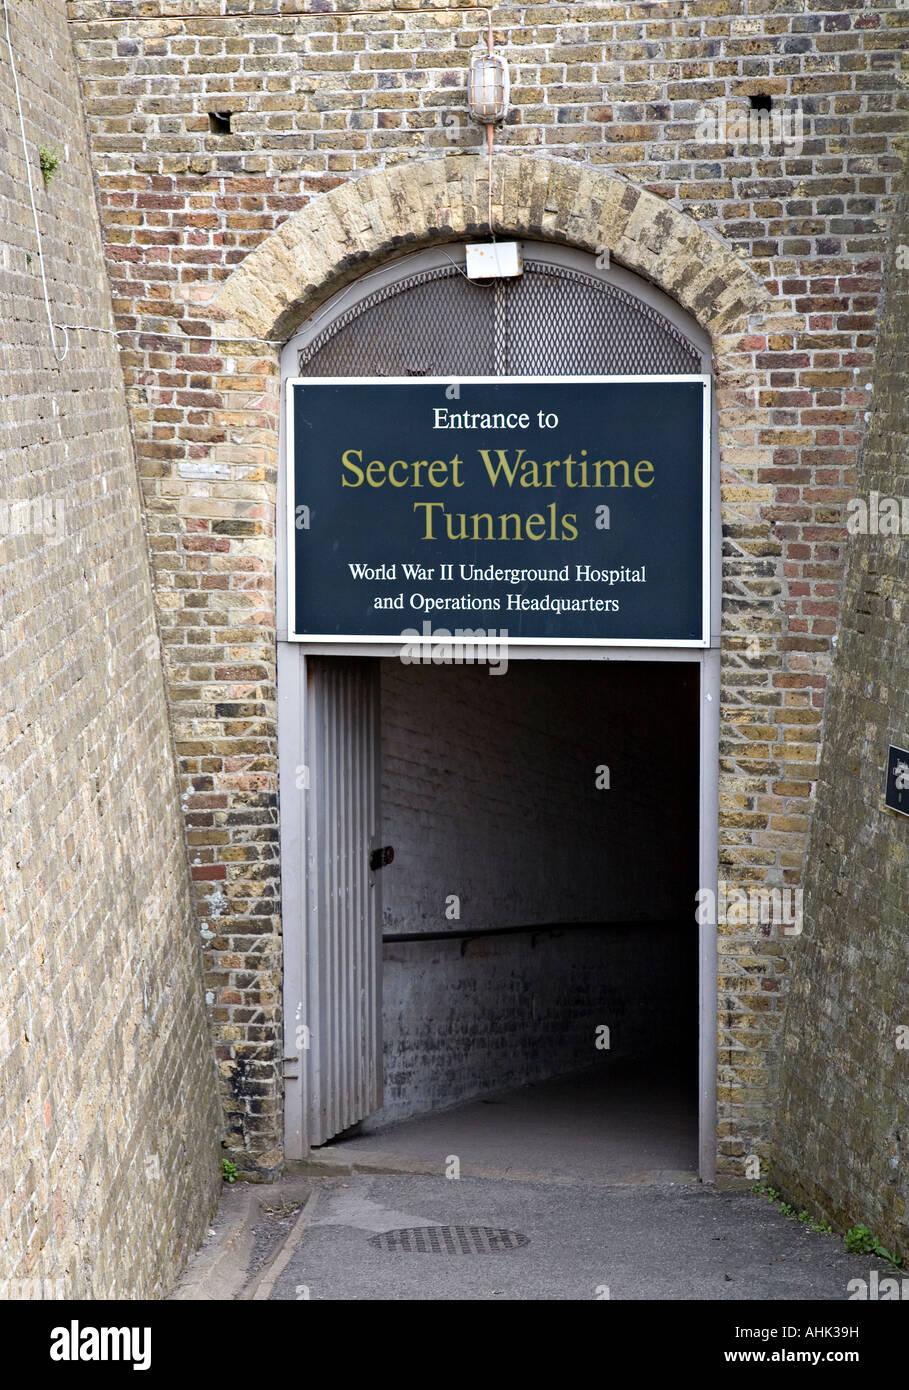 Entrance to the Secret Wartime Tunnels Dover Castle England UK - Stock Image